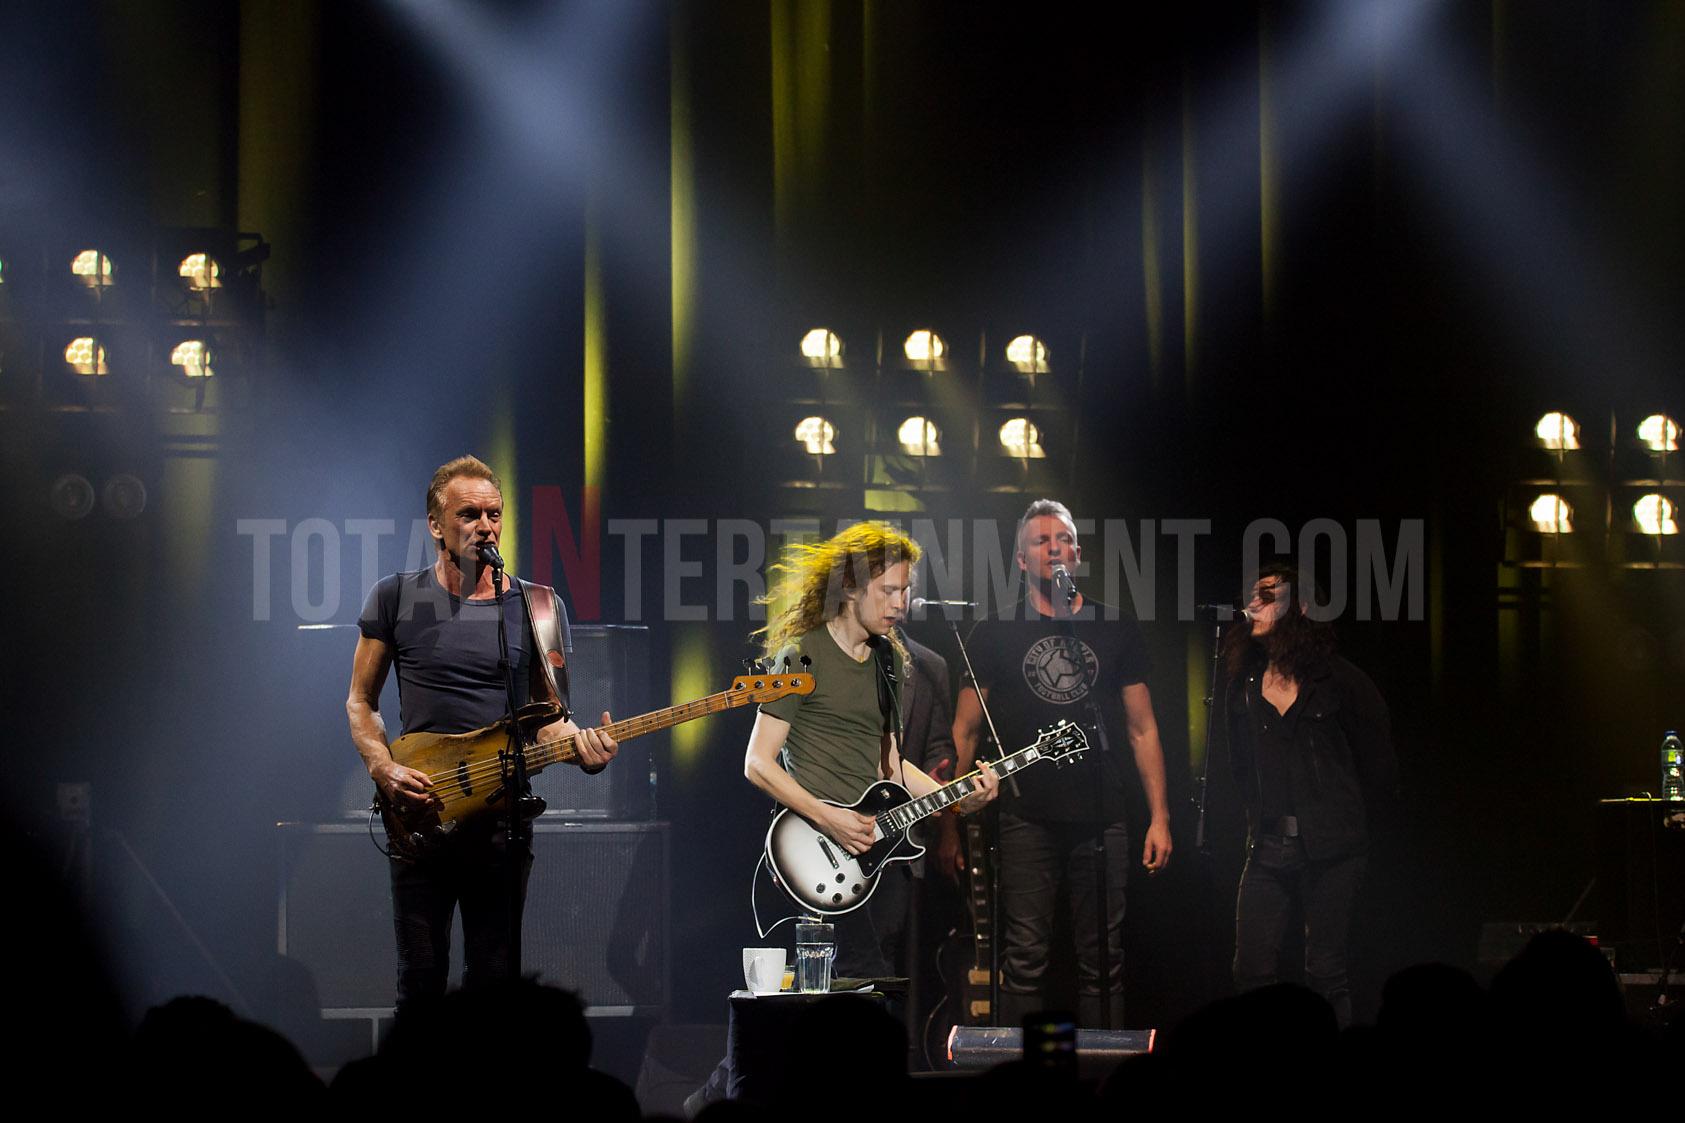 Sting, Manchester, Concert, Live Event